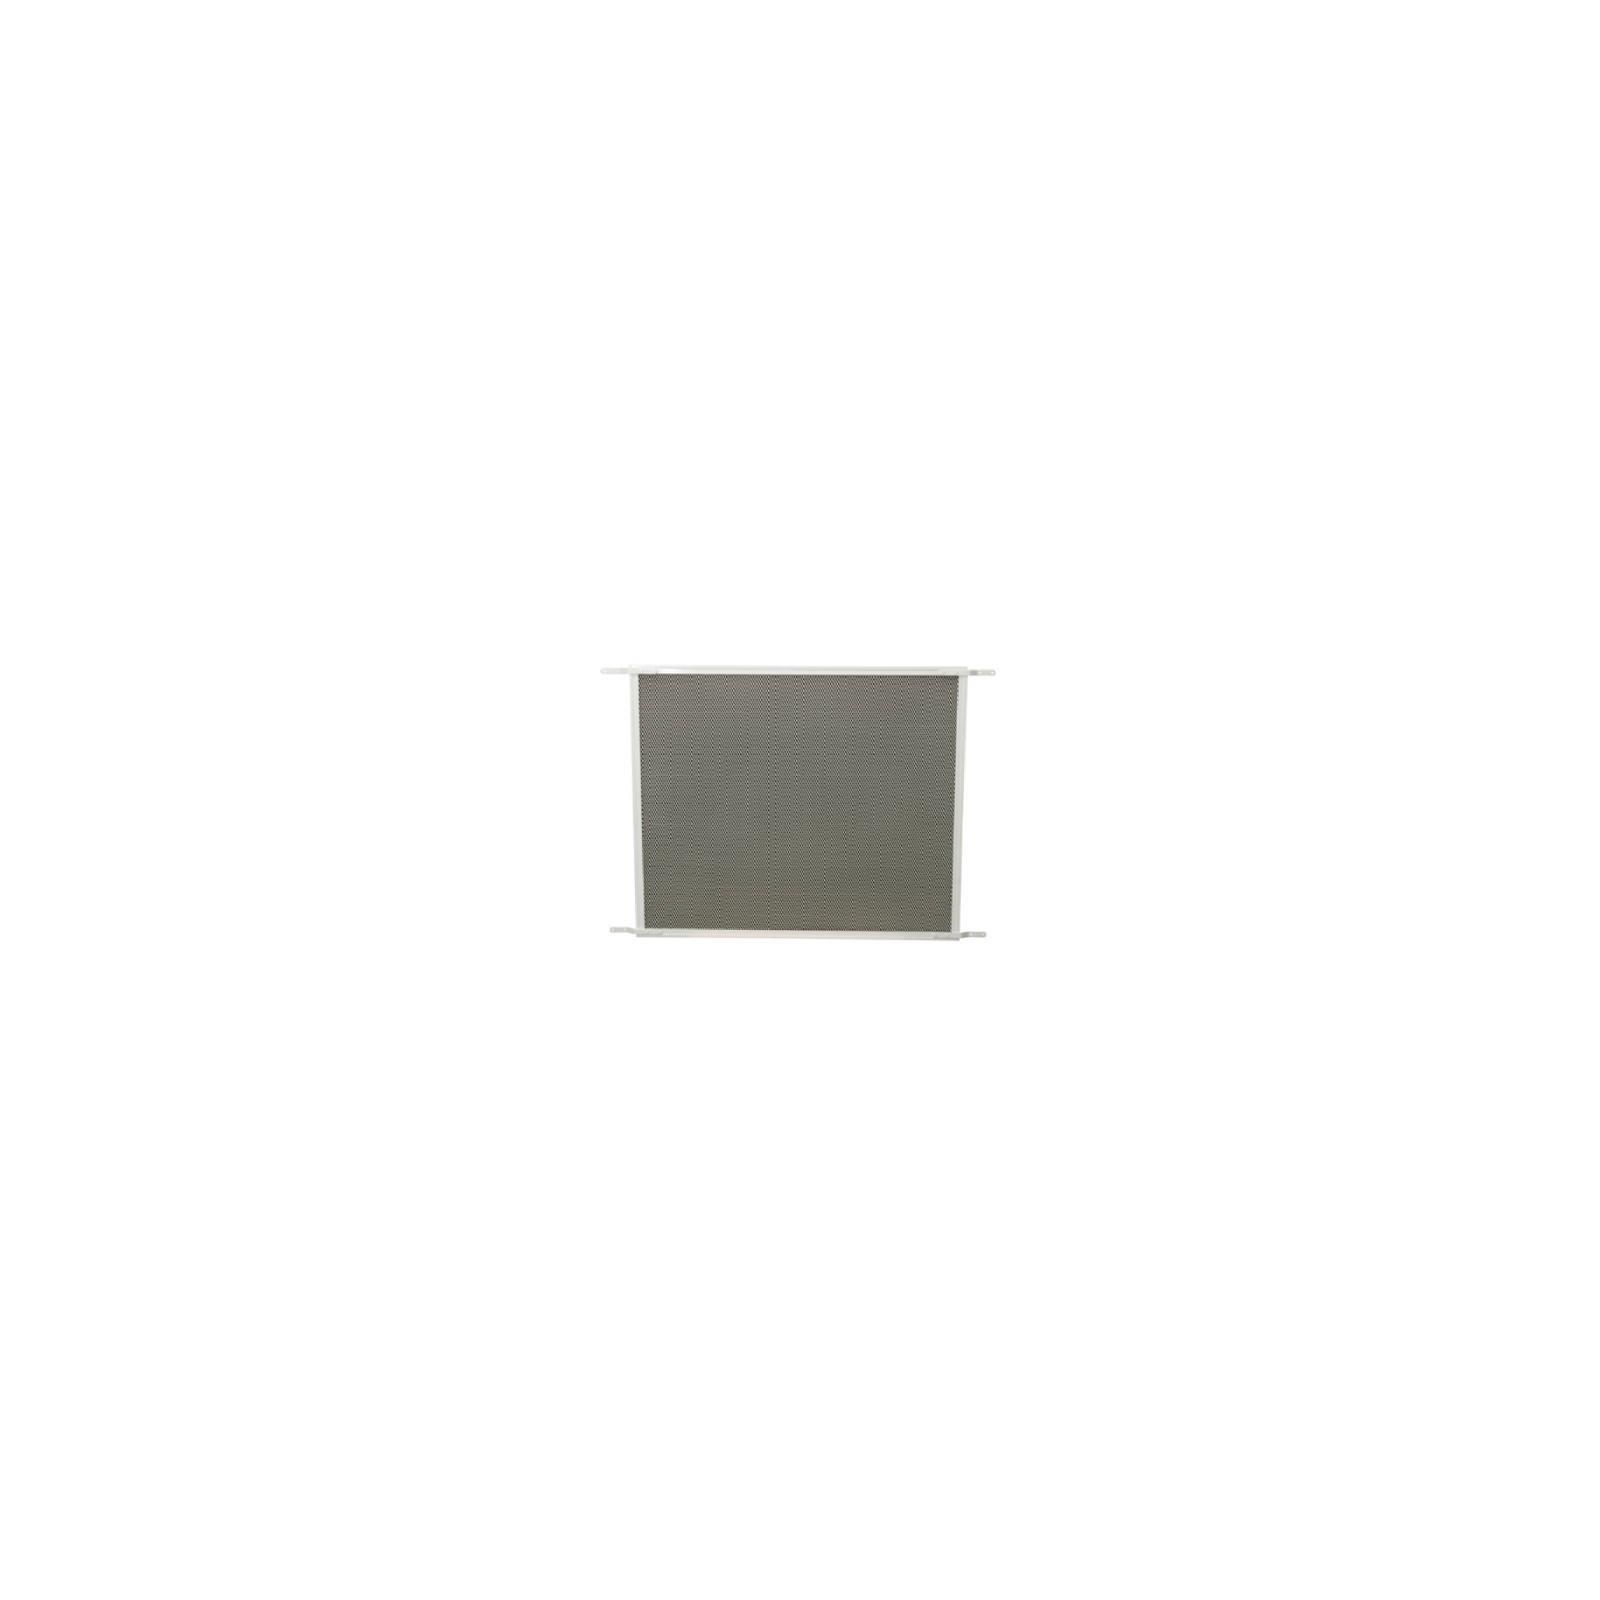 Slide-Co PL 15937 White Finish Sliding Patio Door Grill, 36-Inch